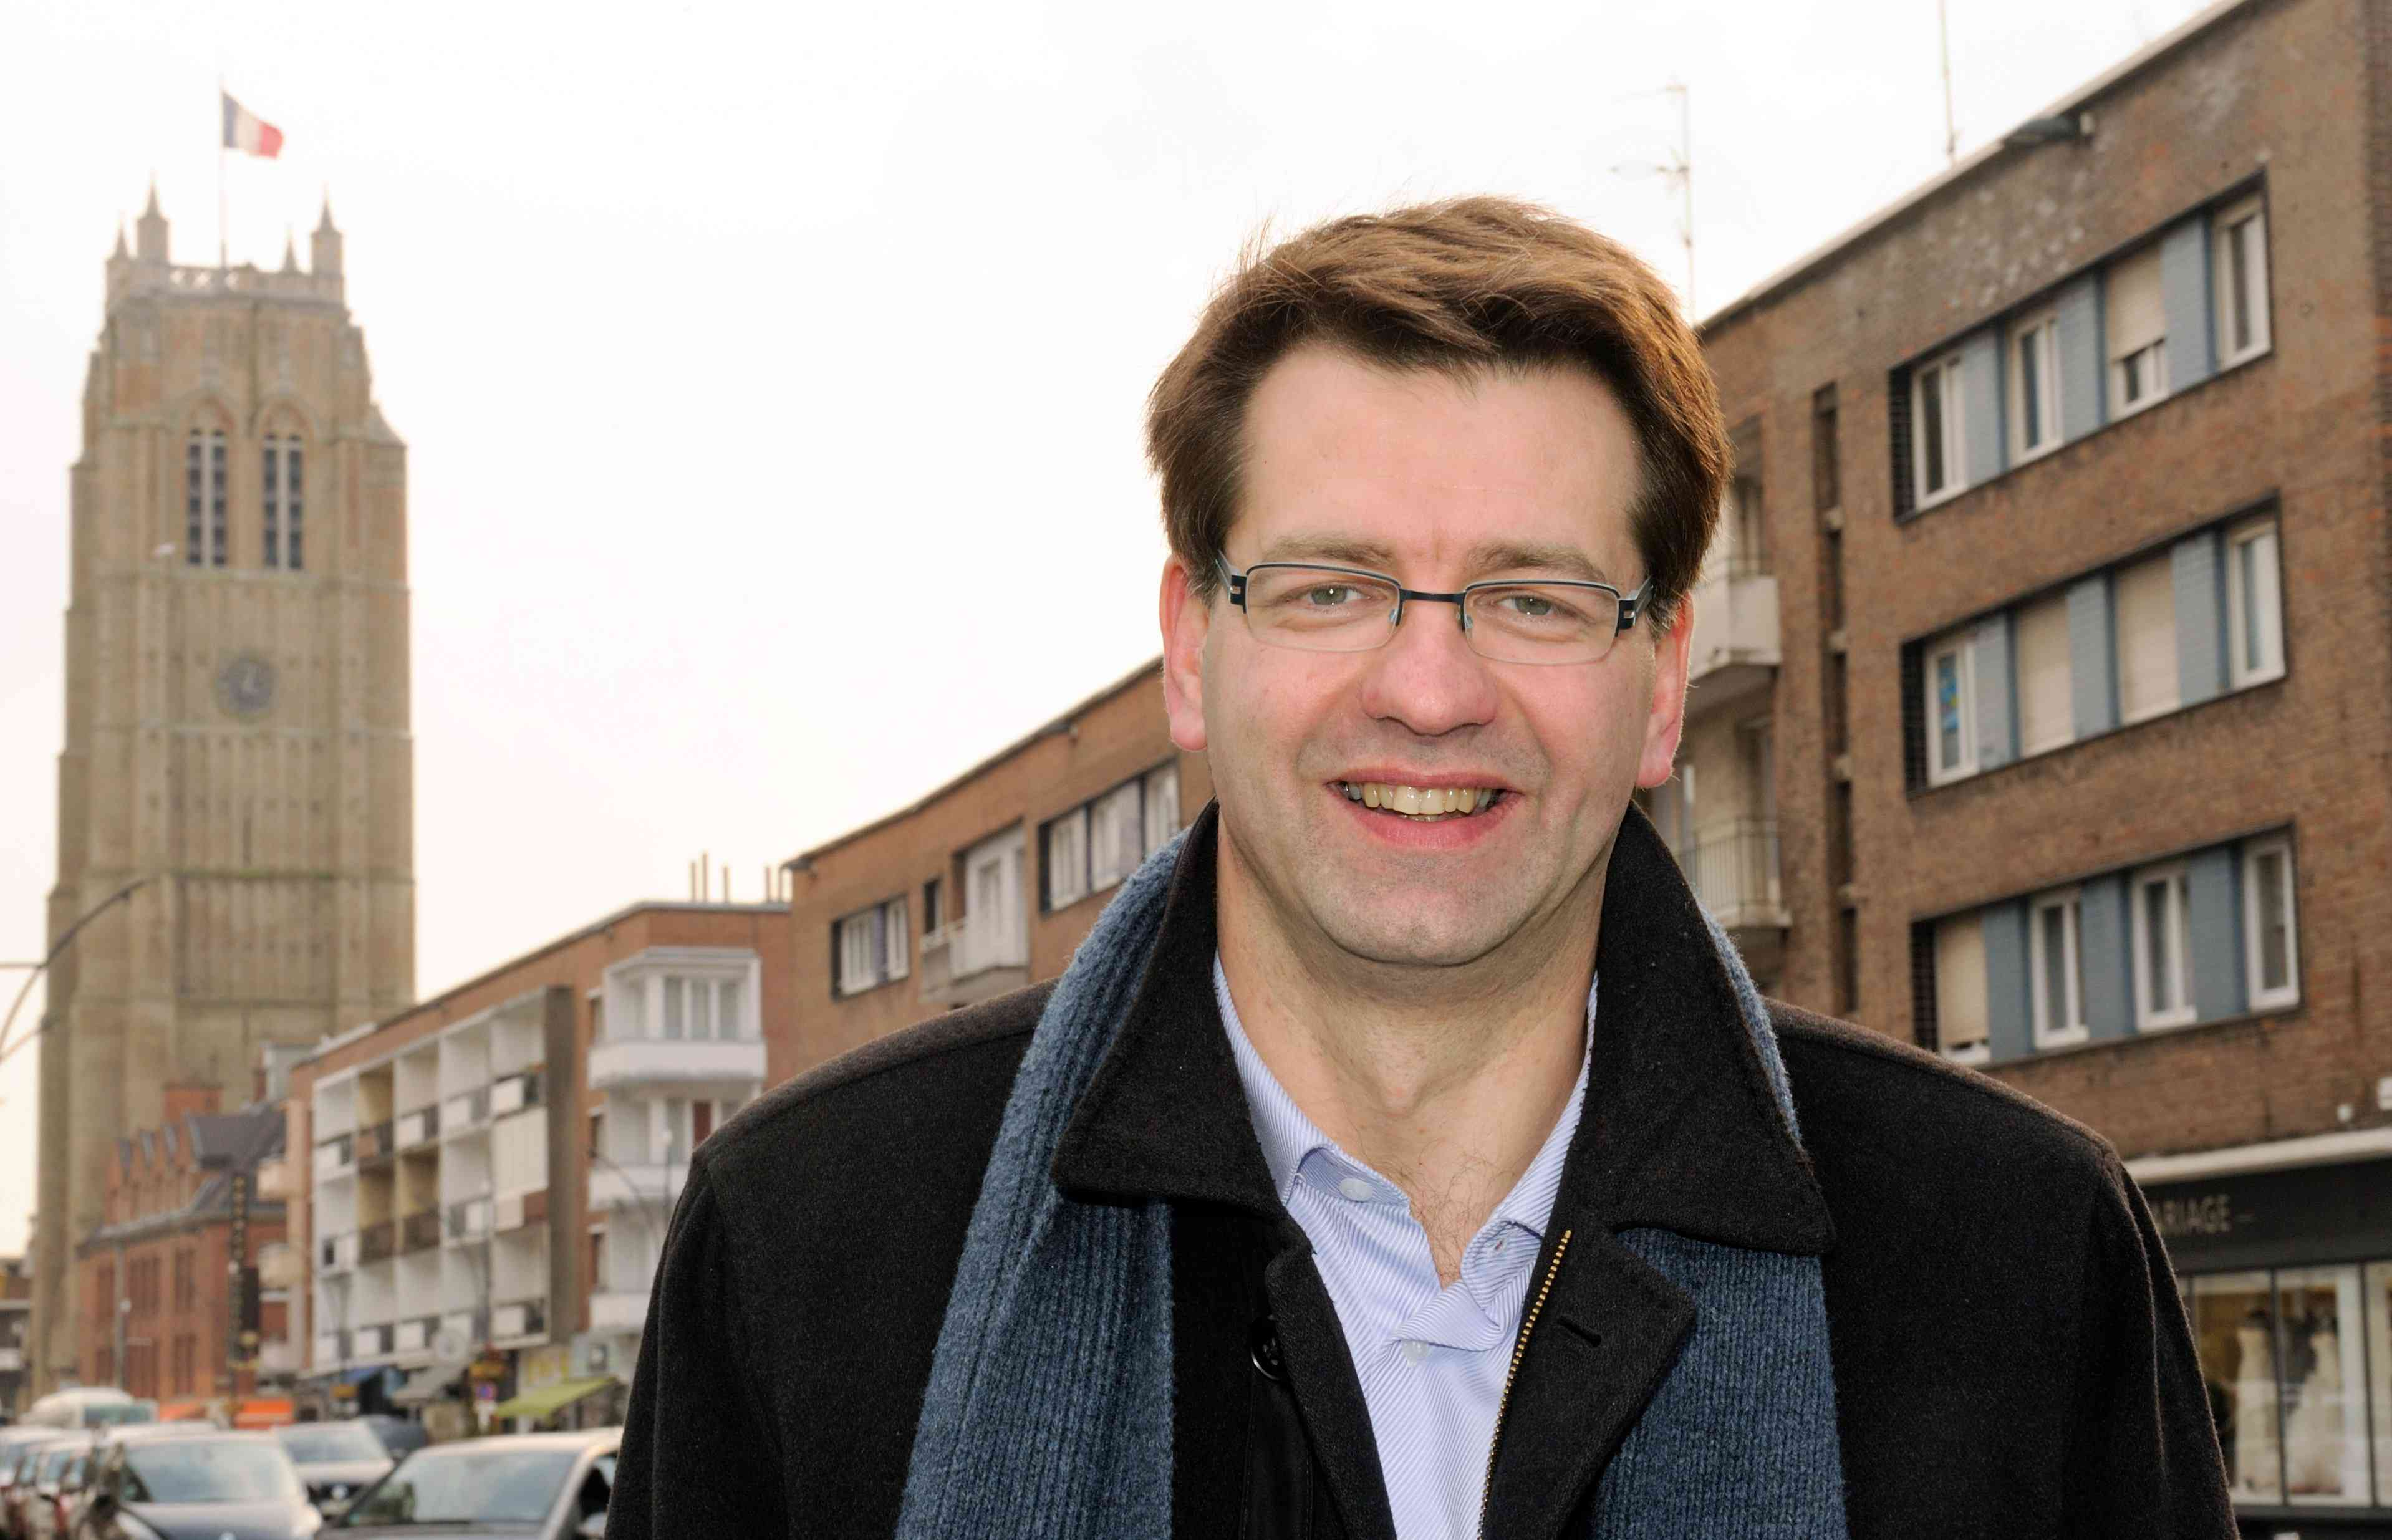 Dunkirk Mayor Patrice Vergriete in 2014